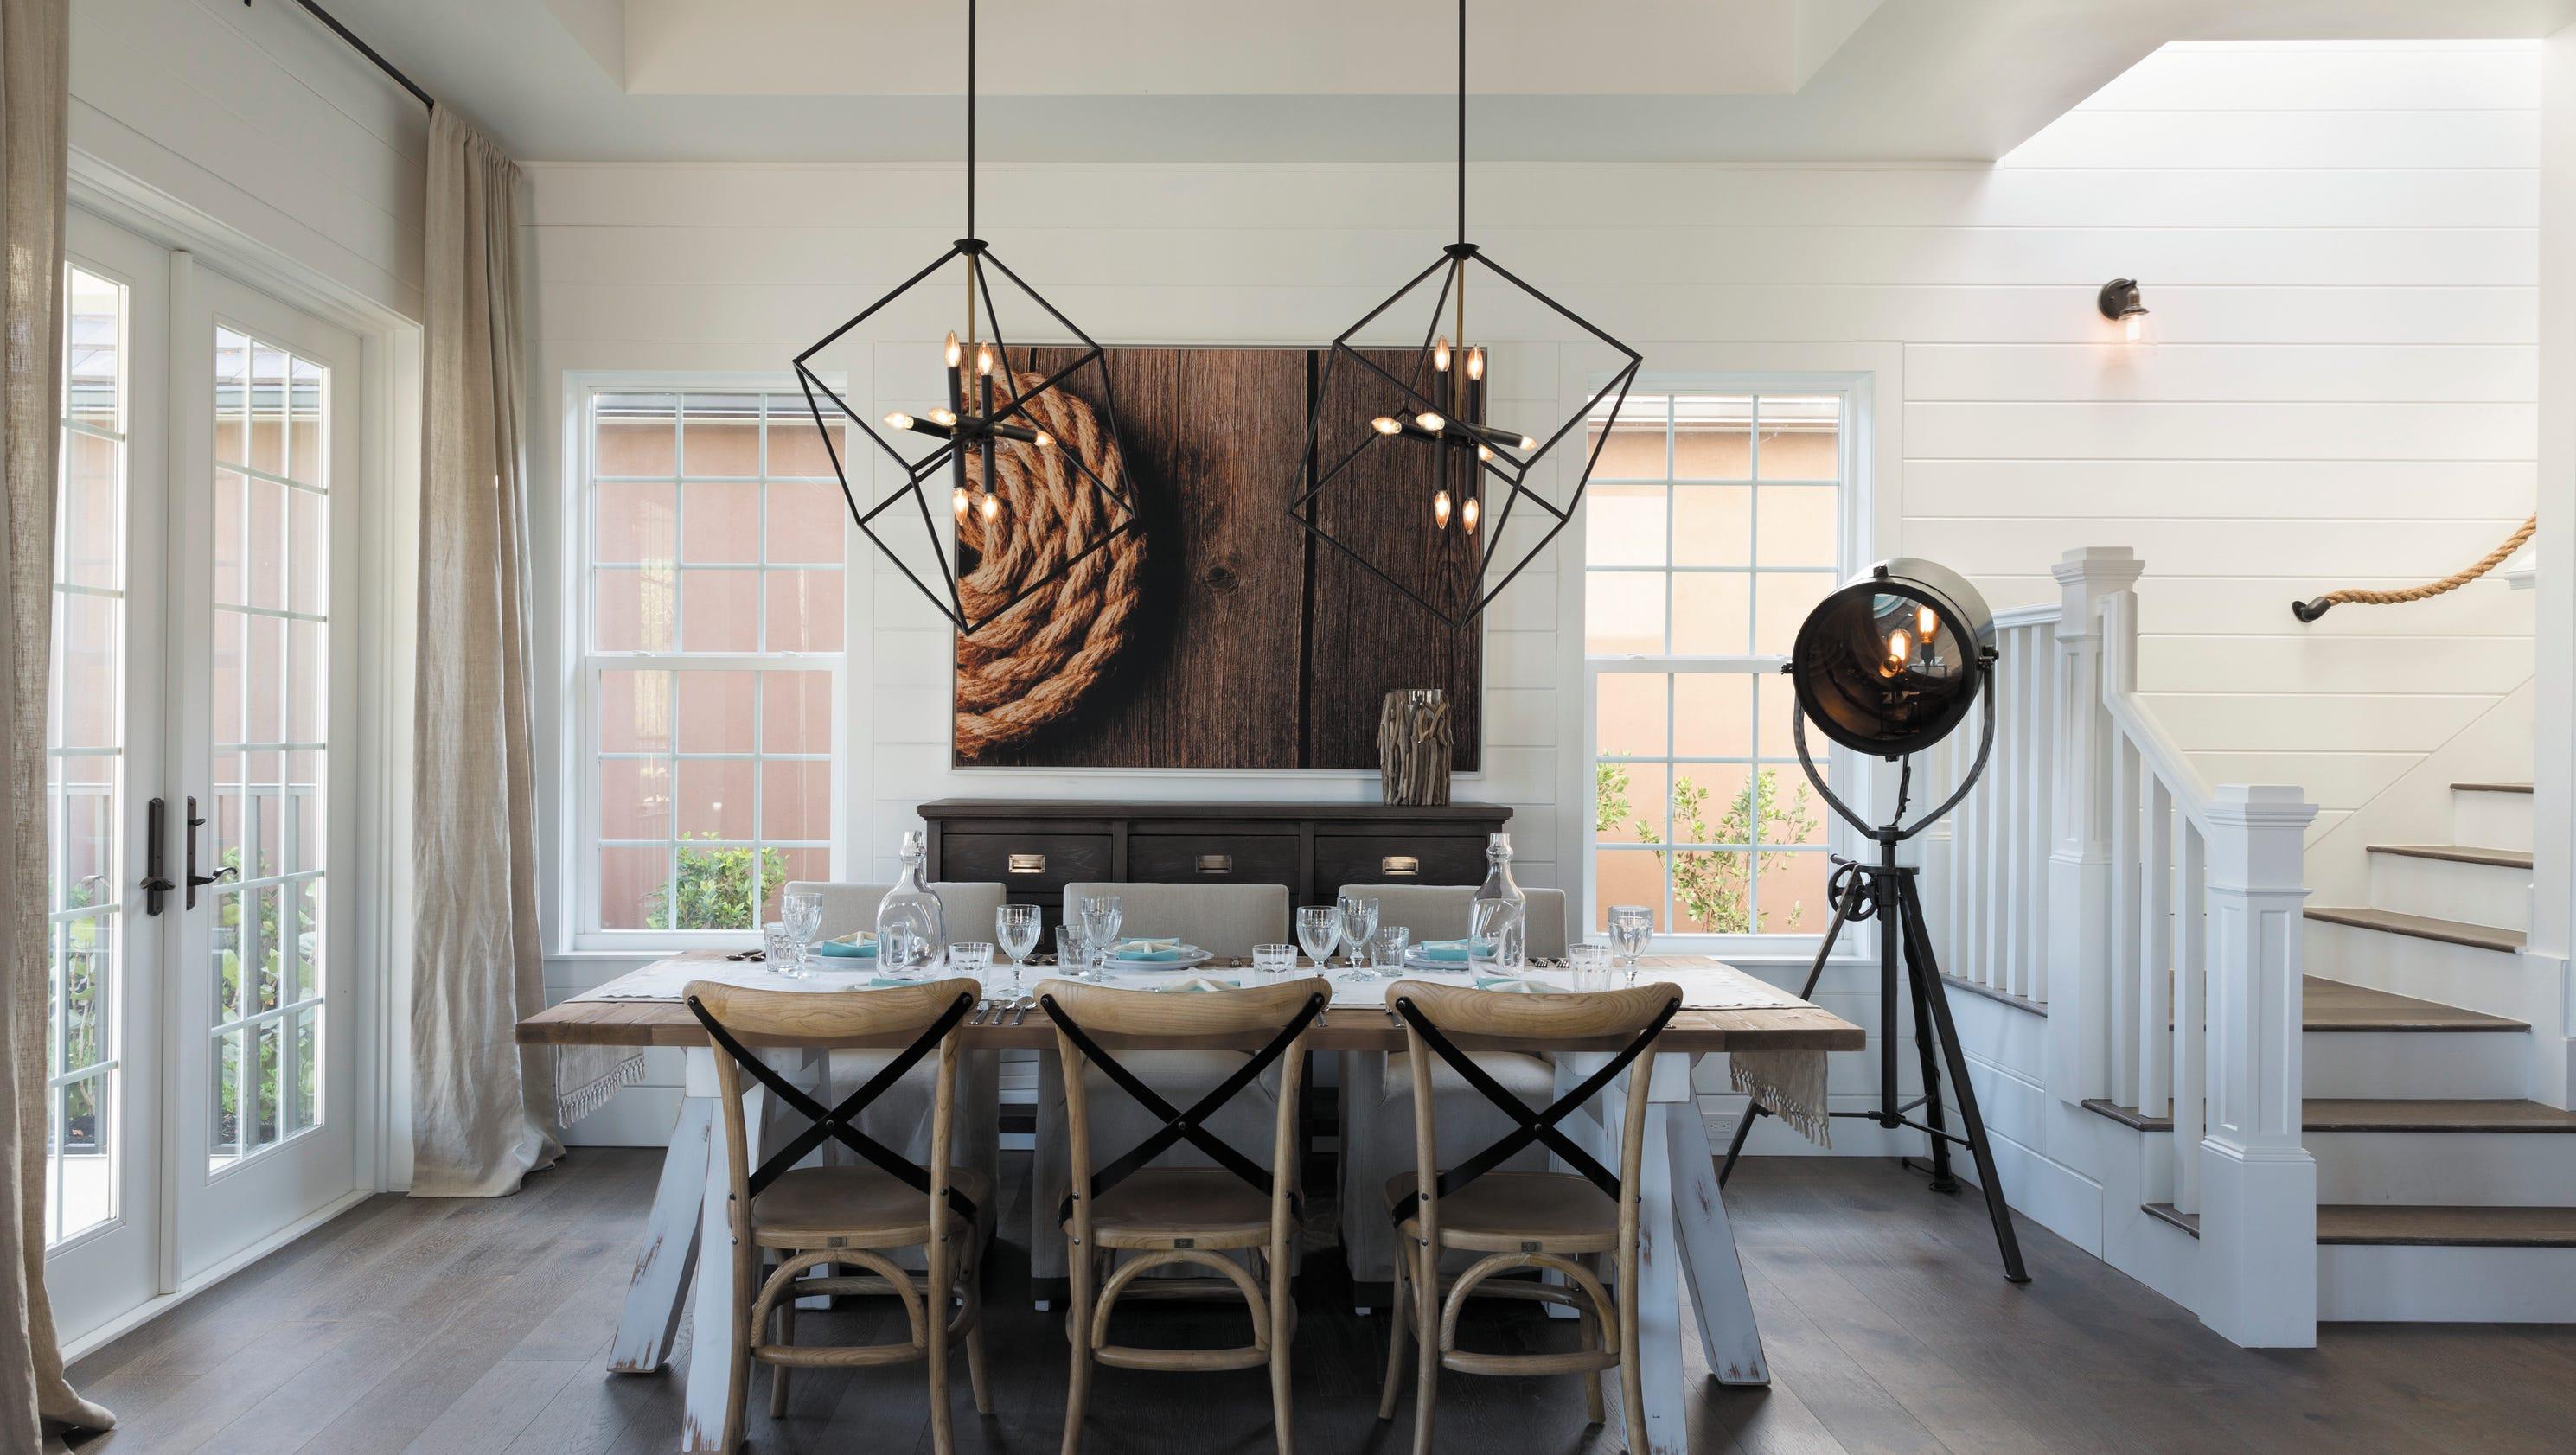 ashton woods coastal model earns parade of homes award. Black Bedroom Furniture Sets. Home Design Ideas